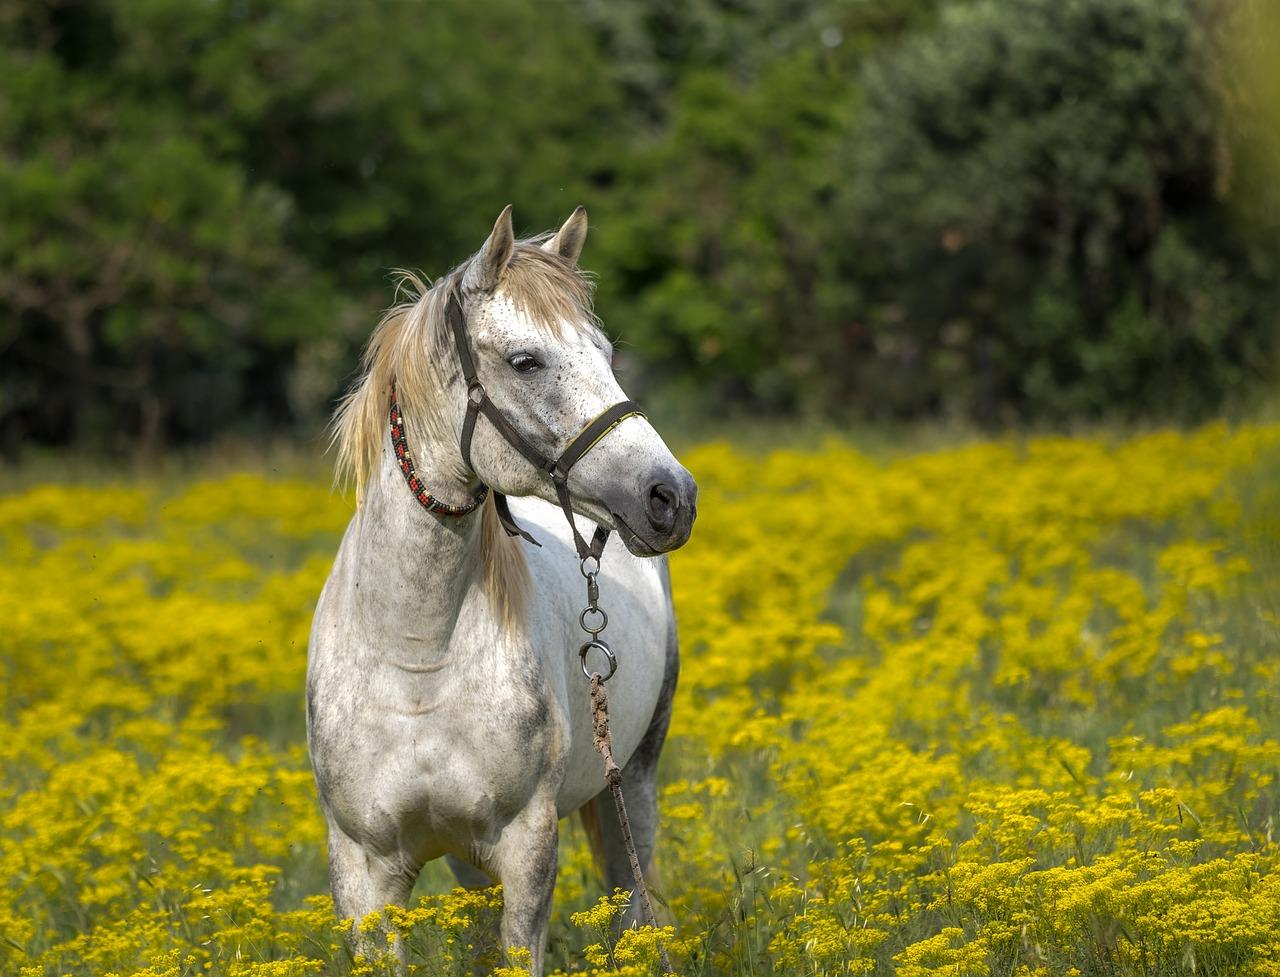 grey horse in a field